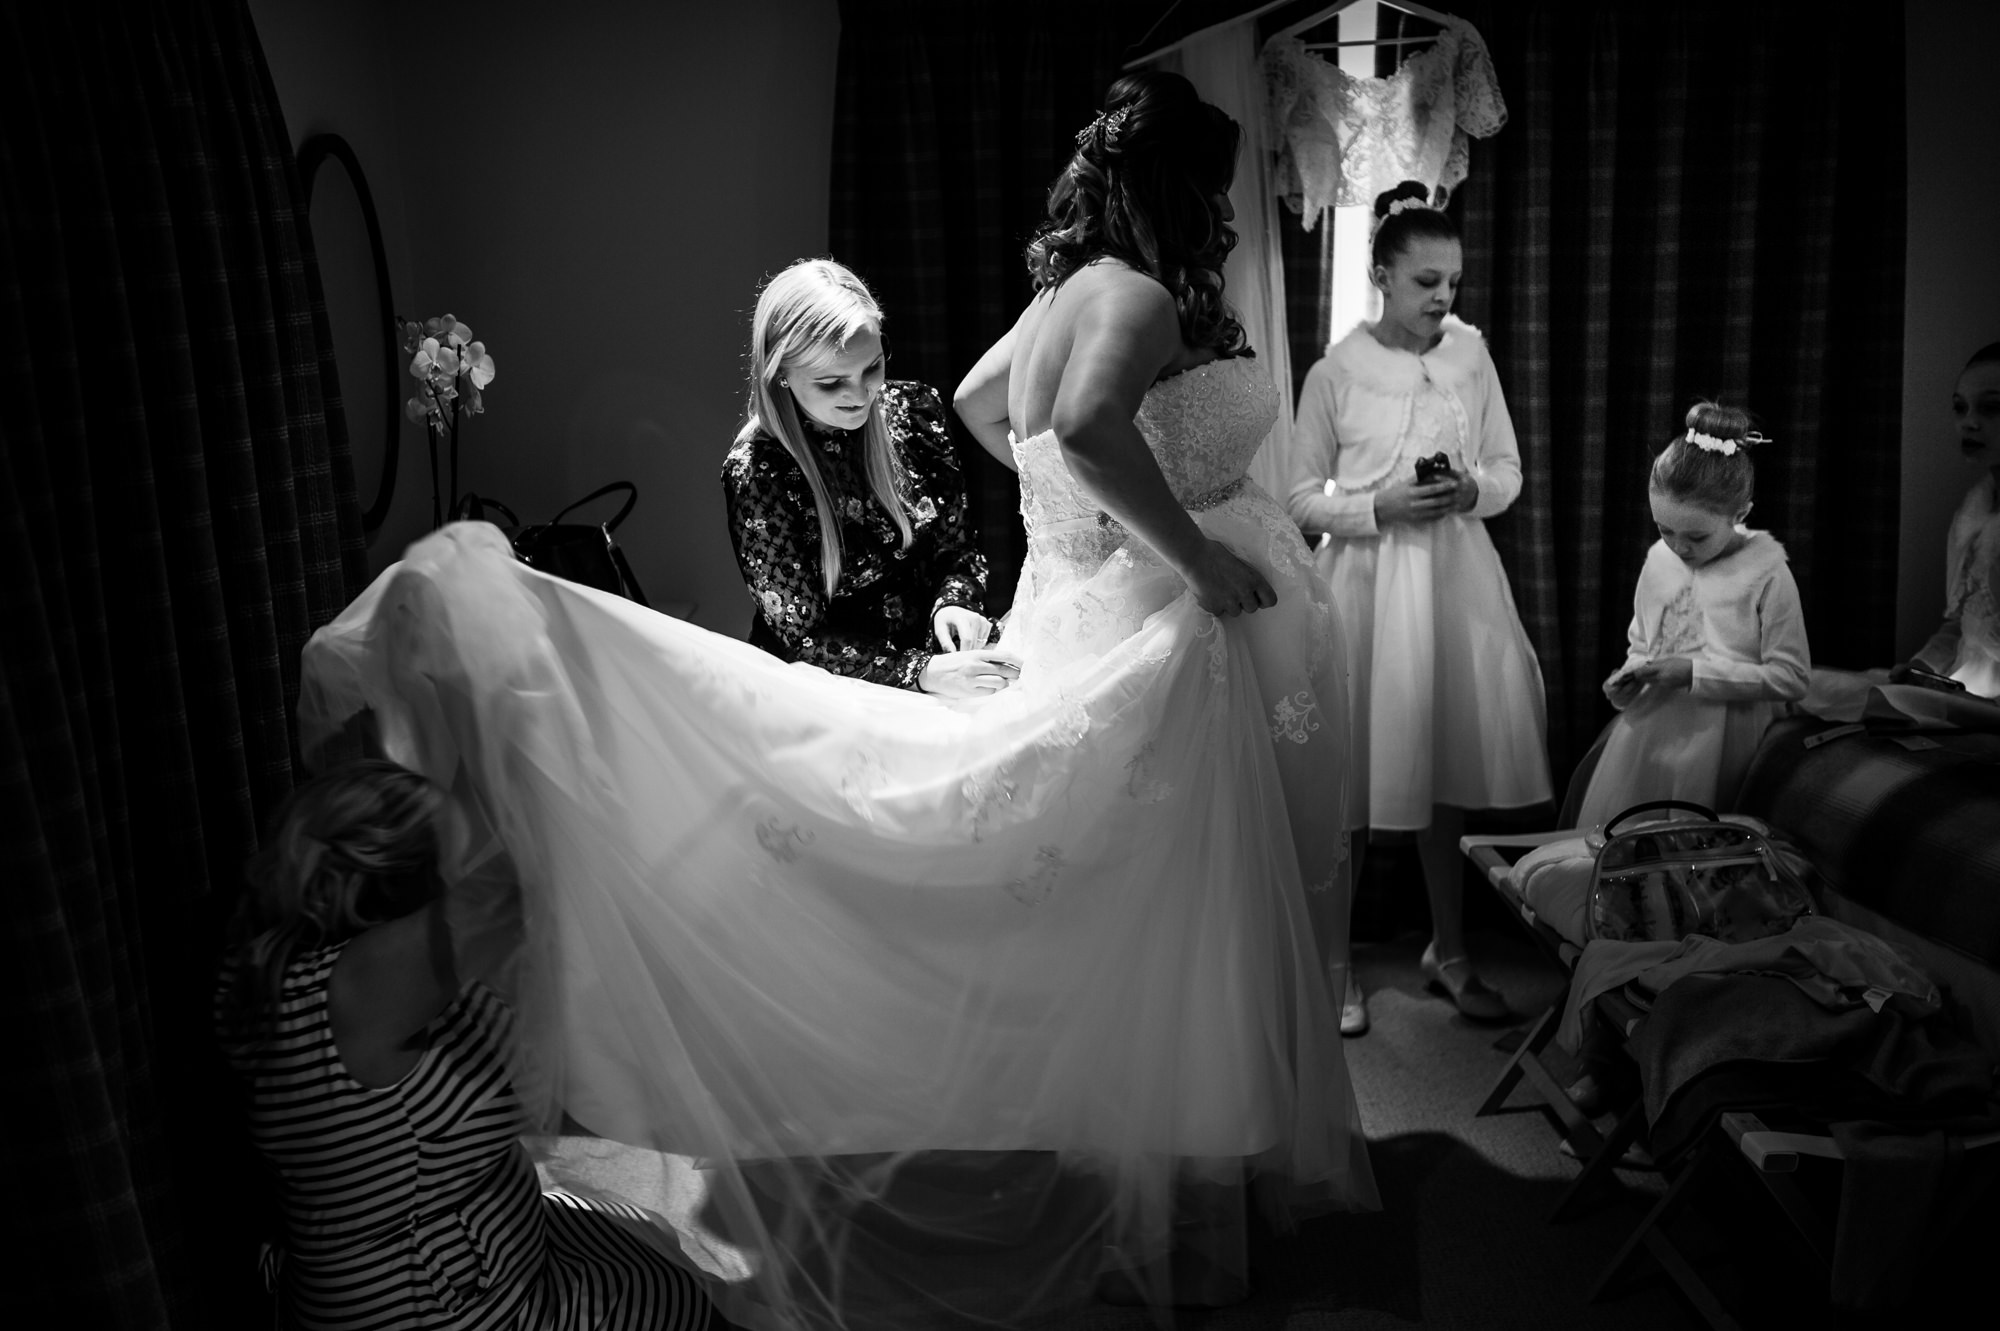 The 3 Daggers weddings